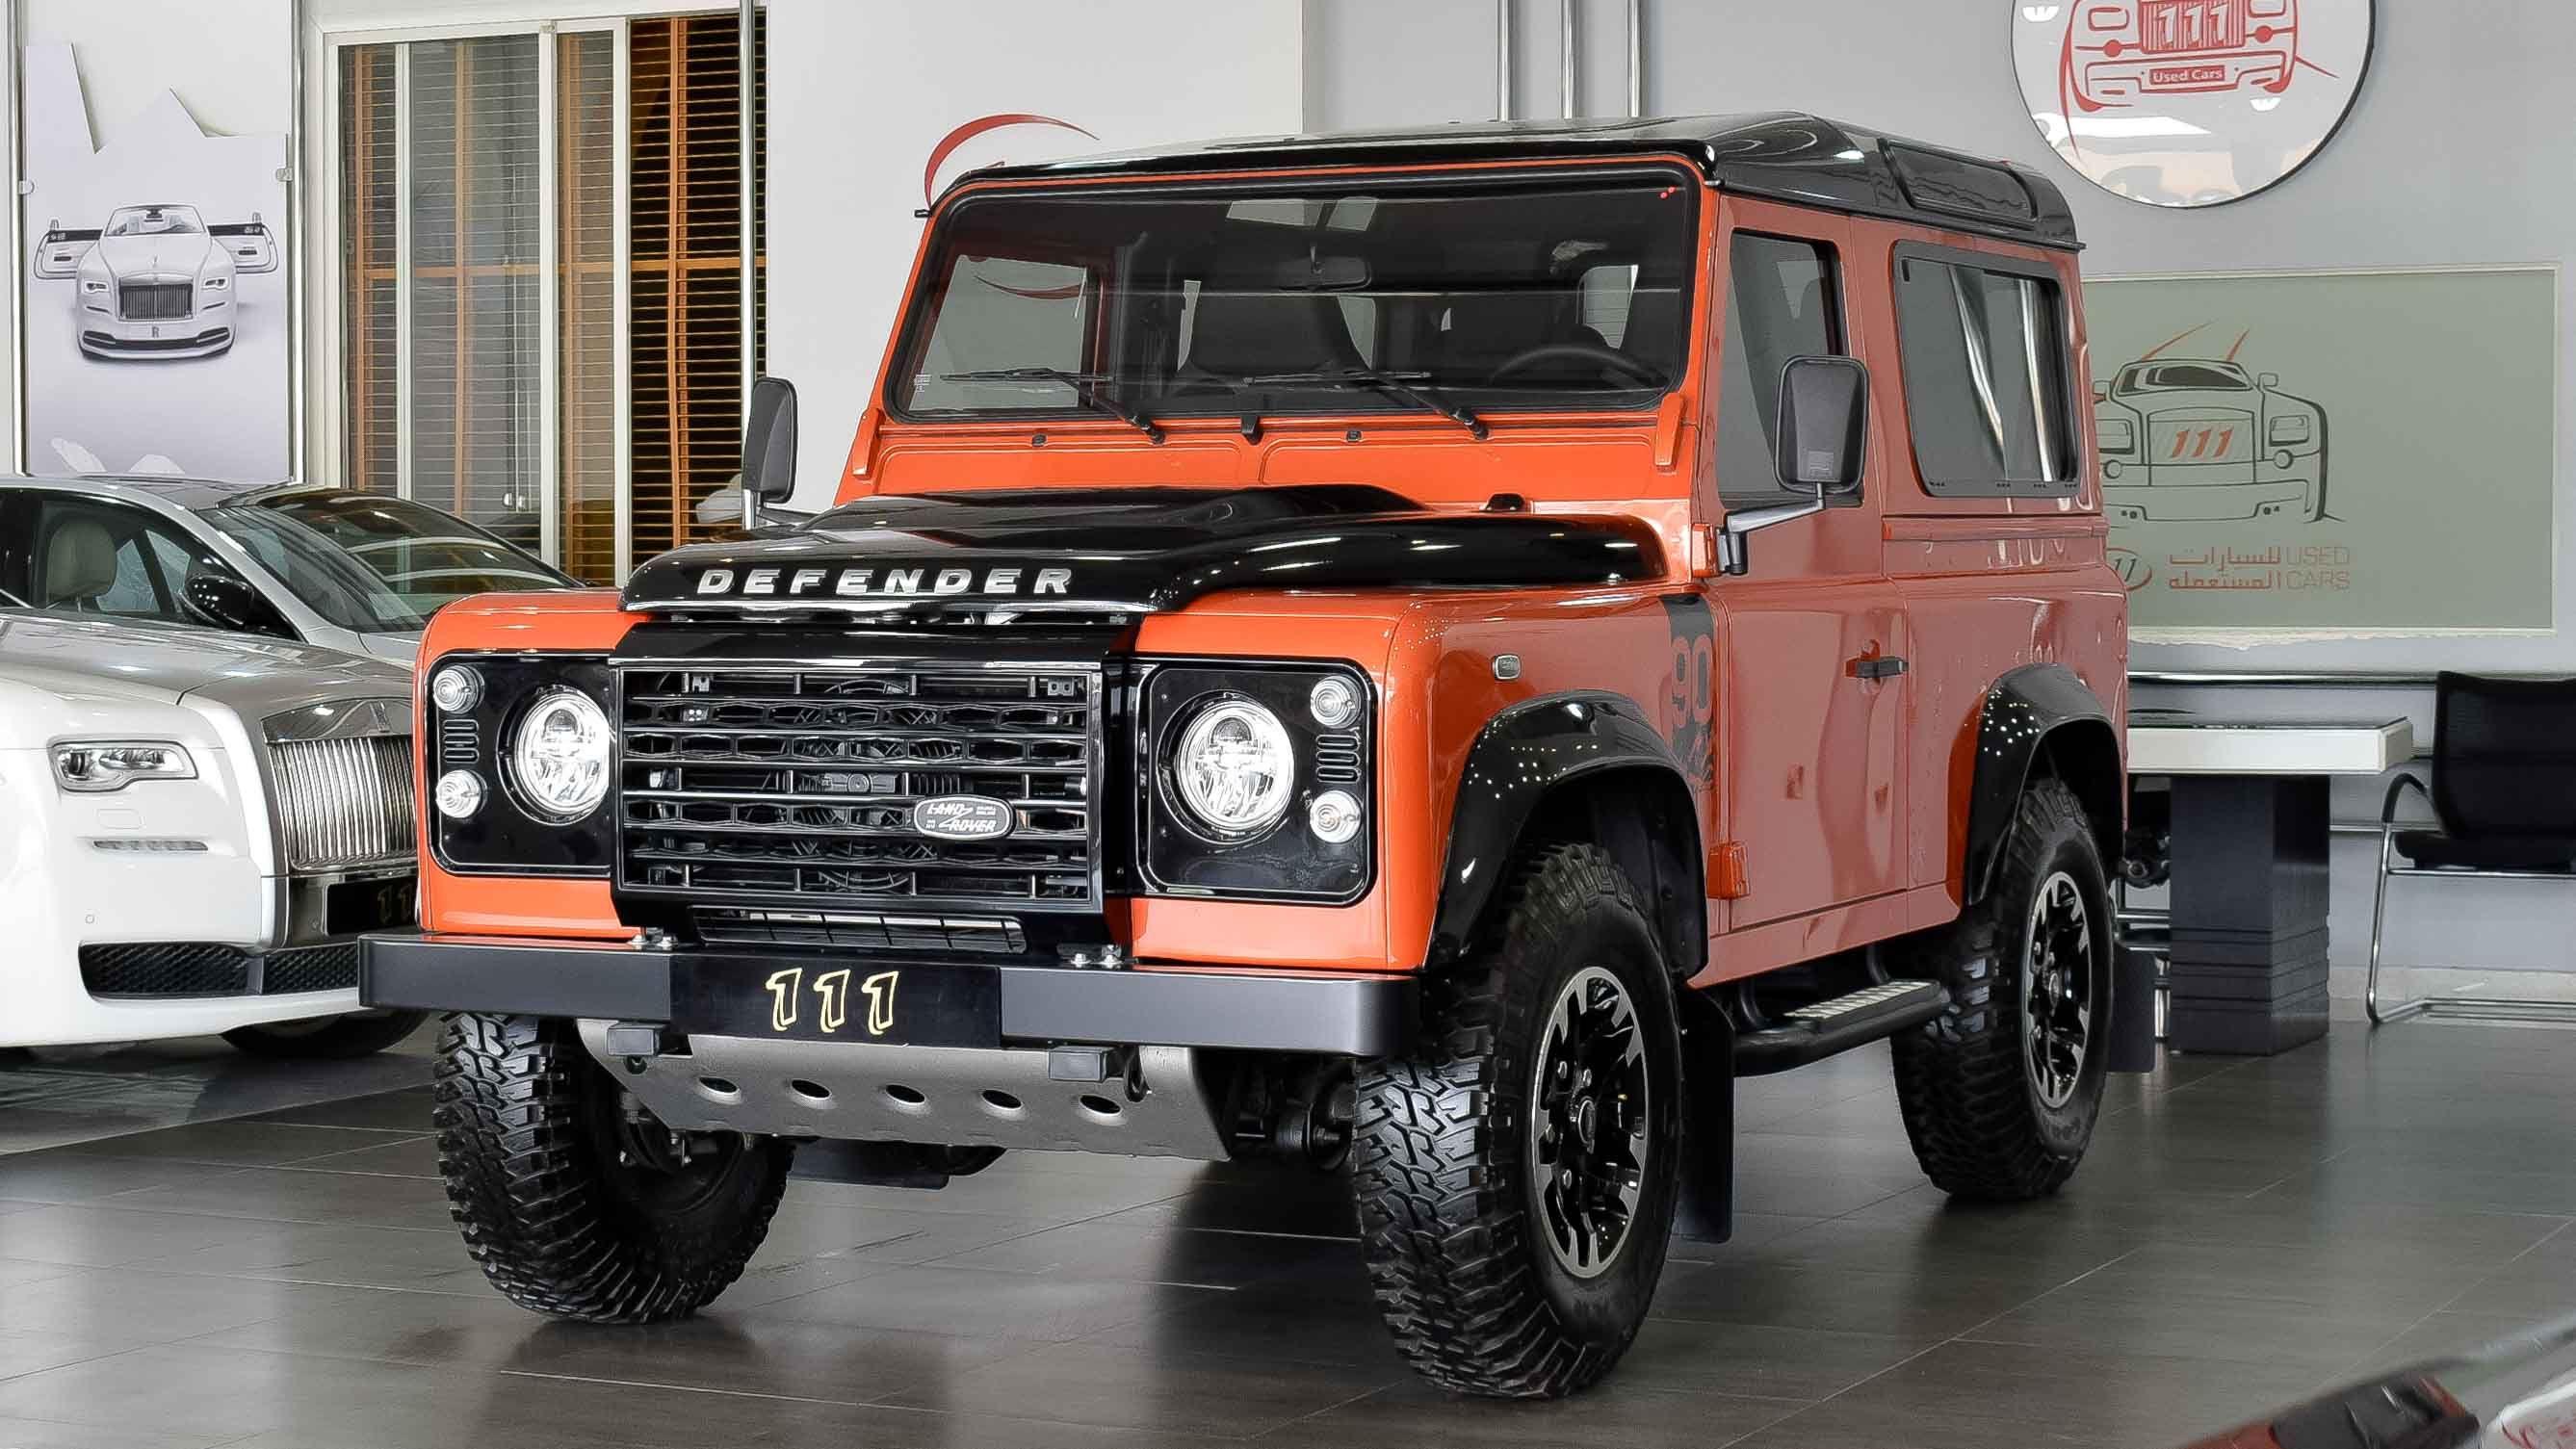 Model Land Rover Defender Gcc Specs Year 2016 Km 0 Price Uae